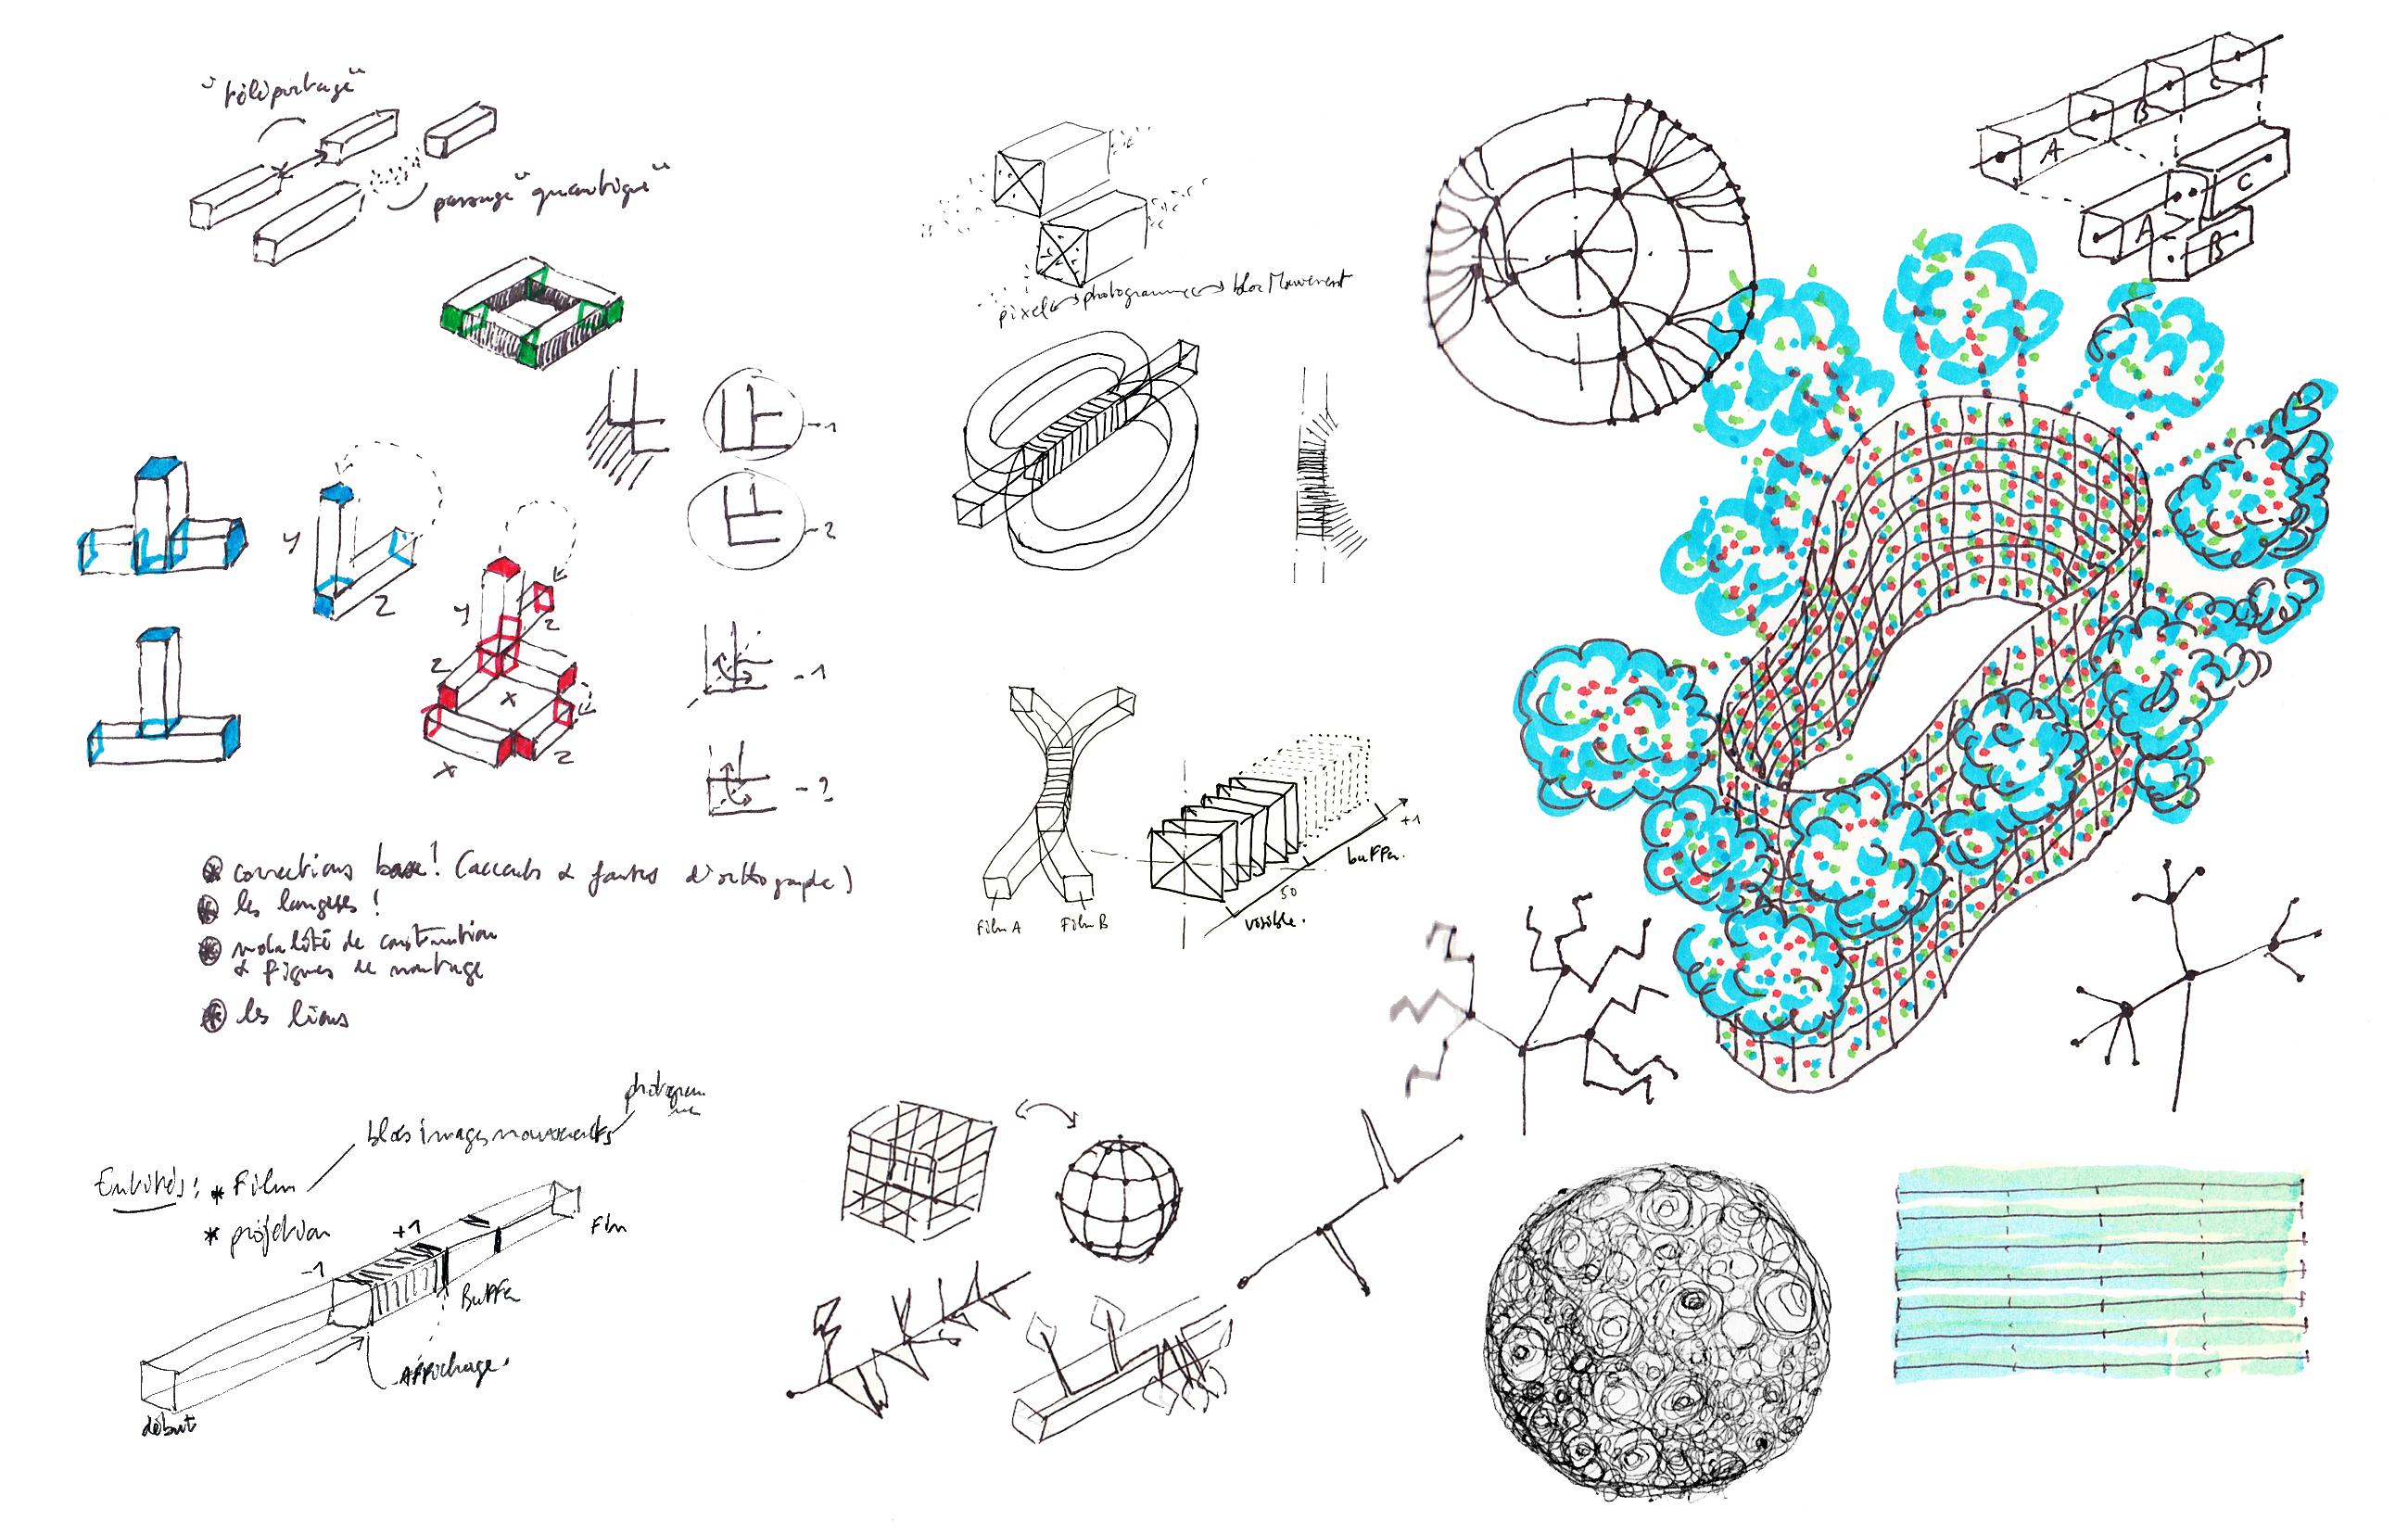 montage-illustration-mg-8